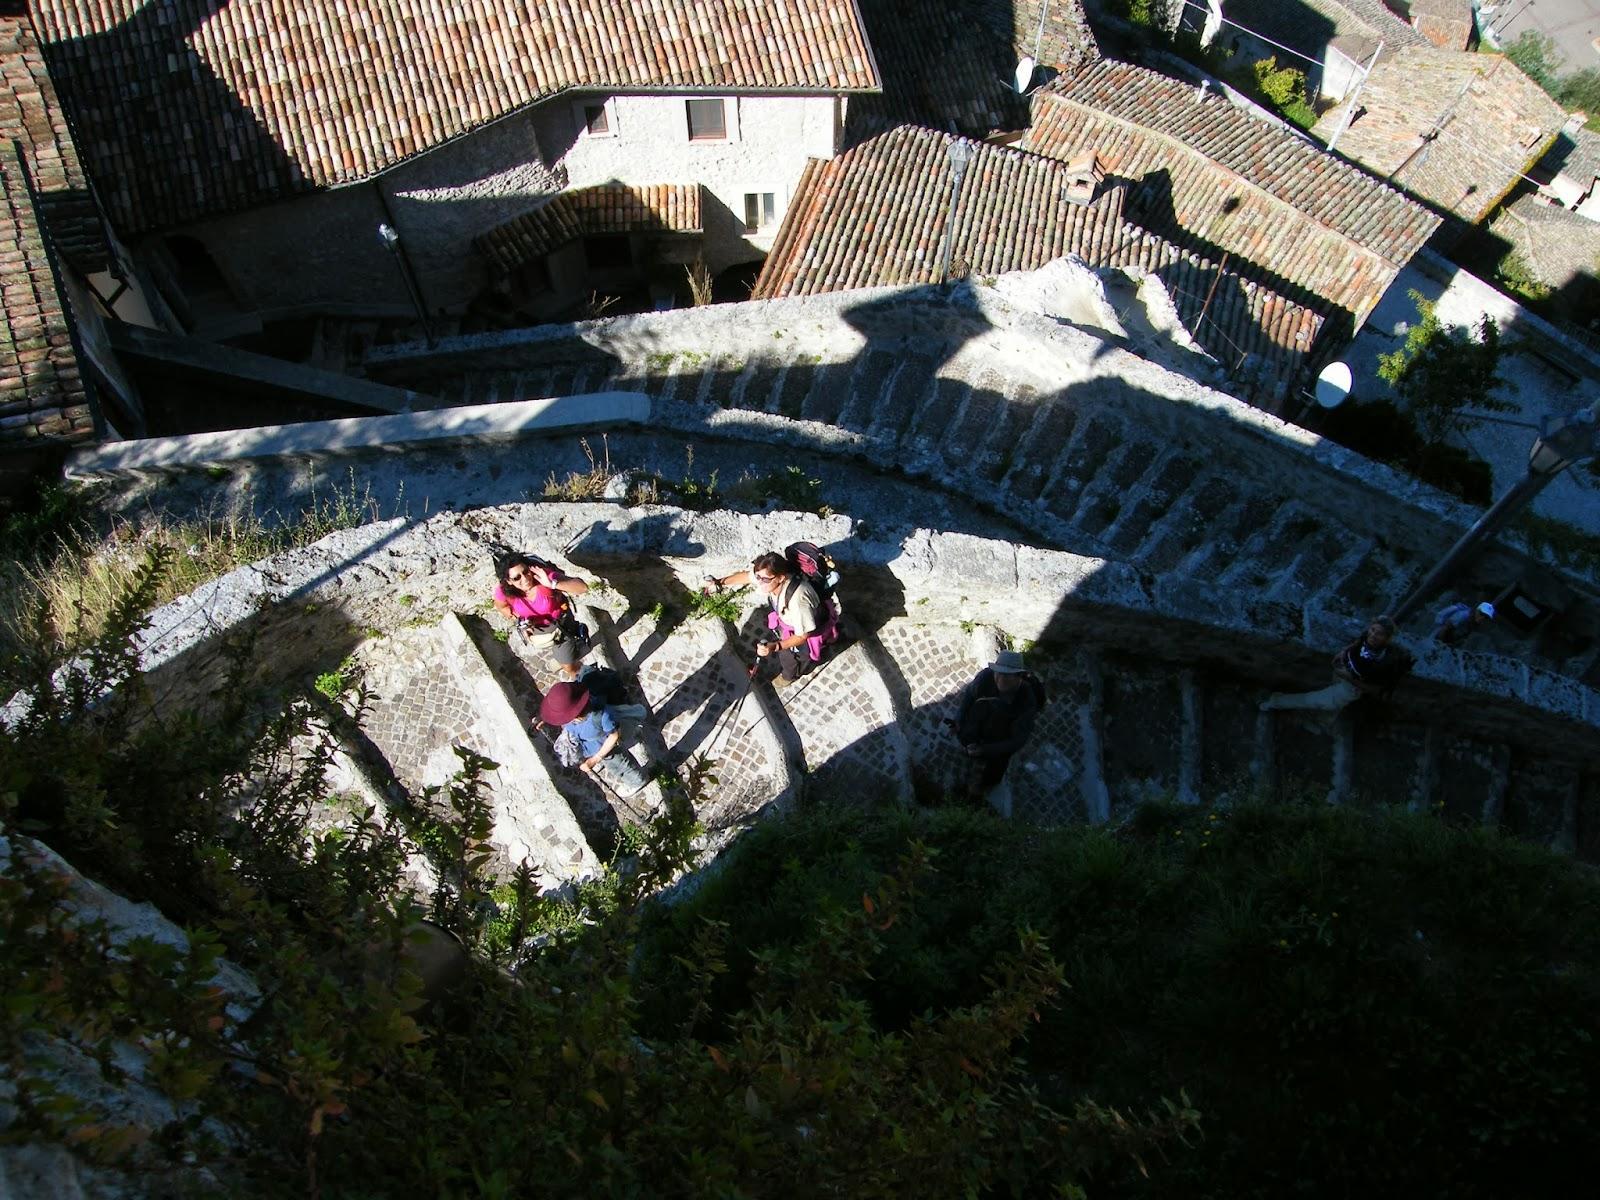 Di quì passò Francesco: Cammino Meditativo di San Benedetto ...